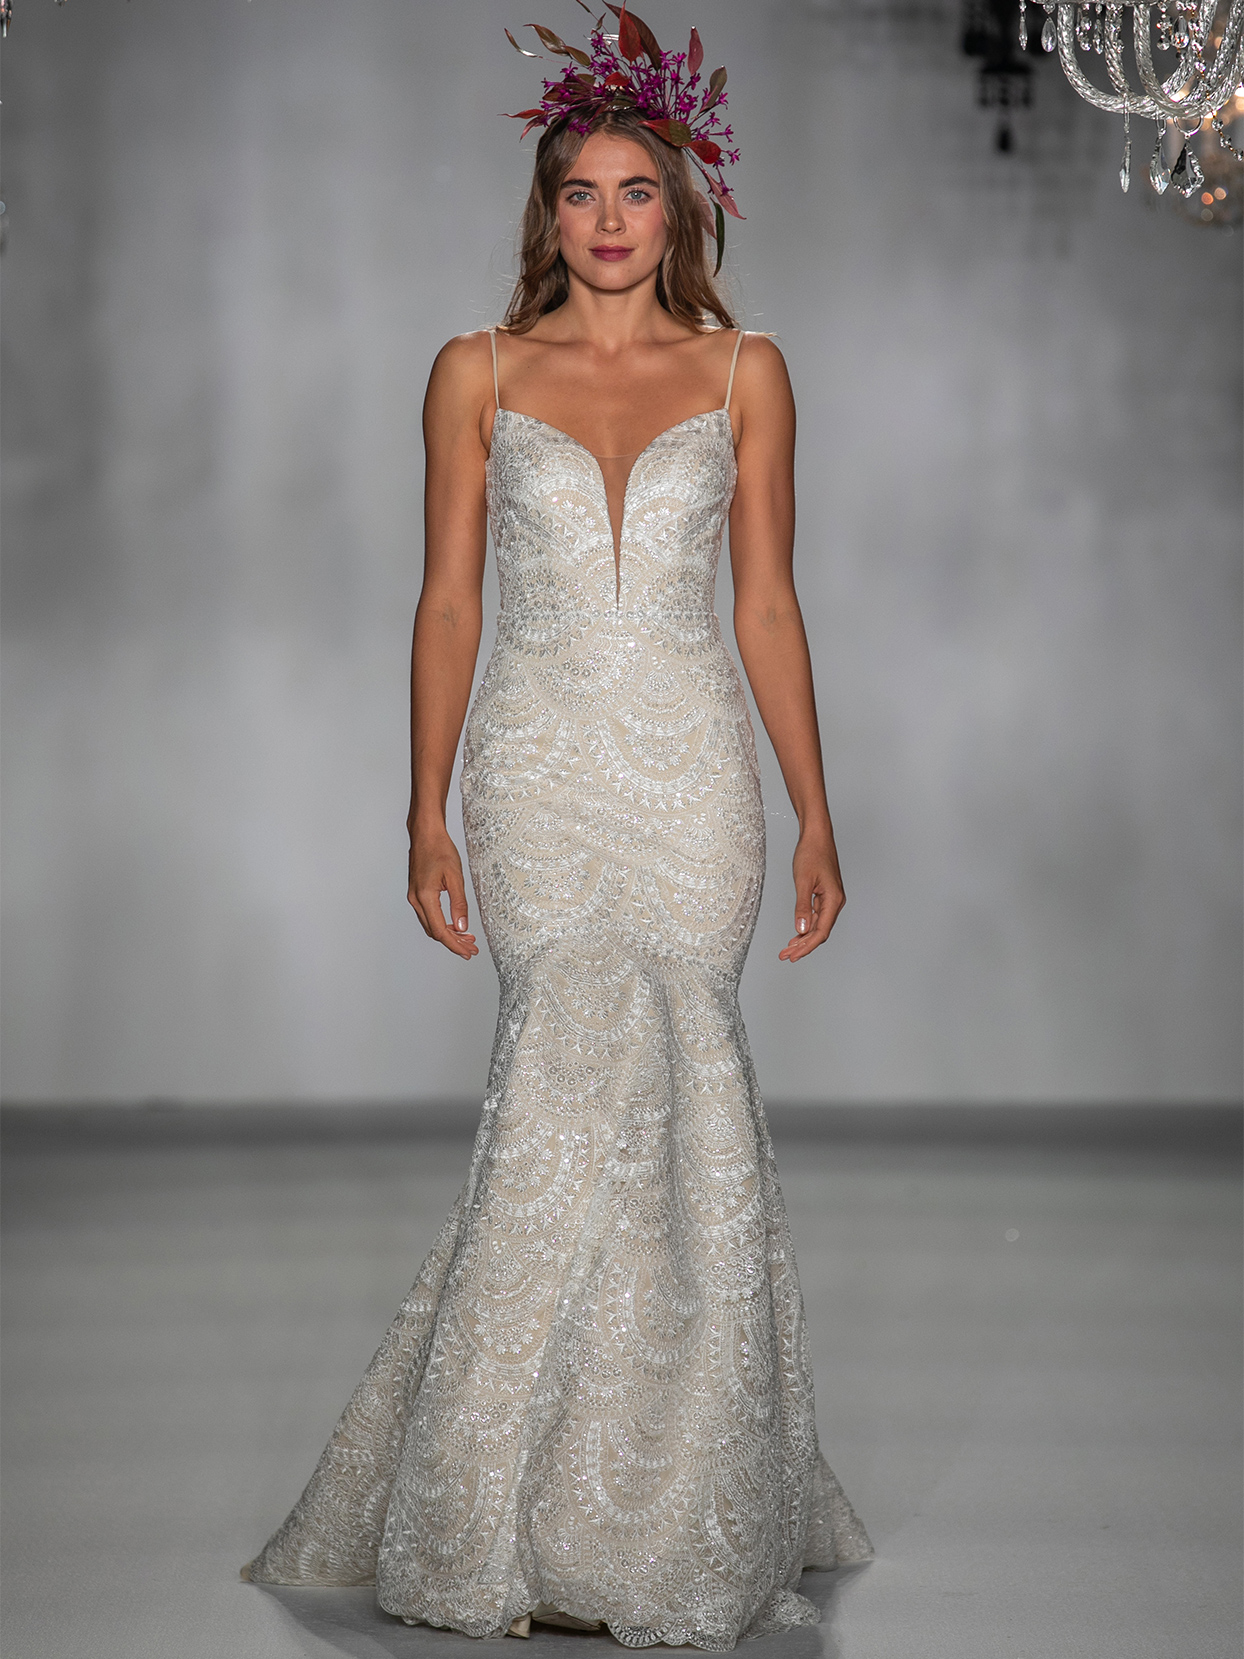 anne barge cream lace mermaid wedding dress fall 2020